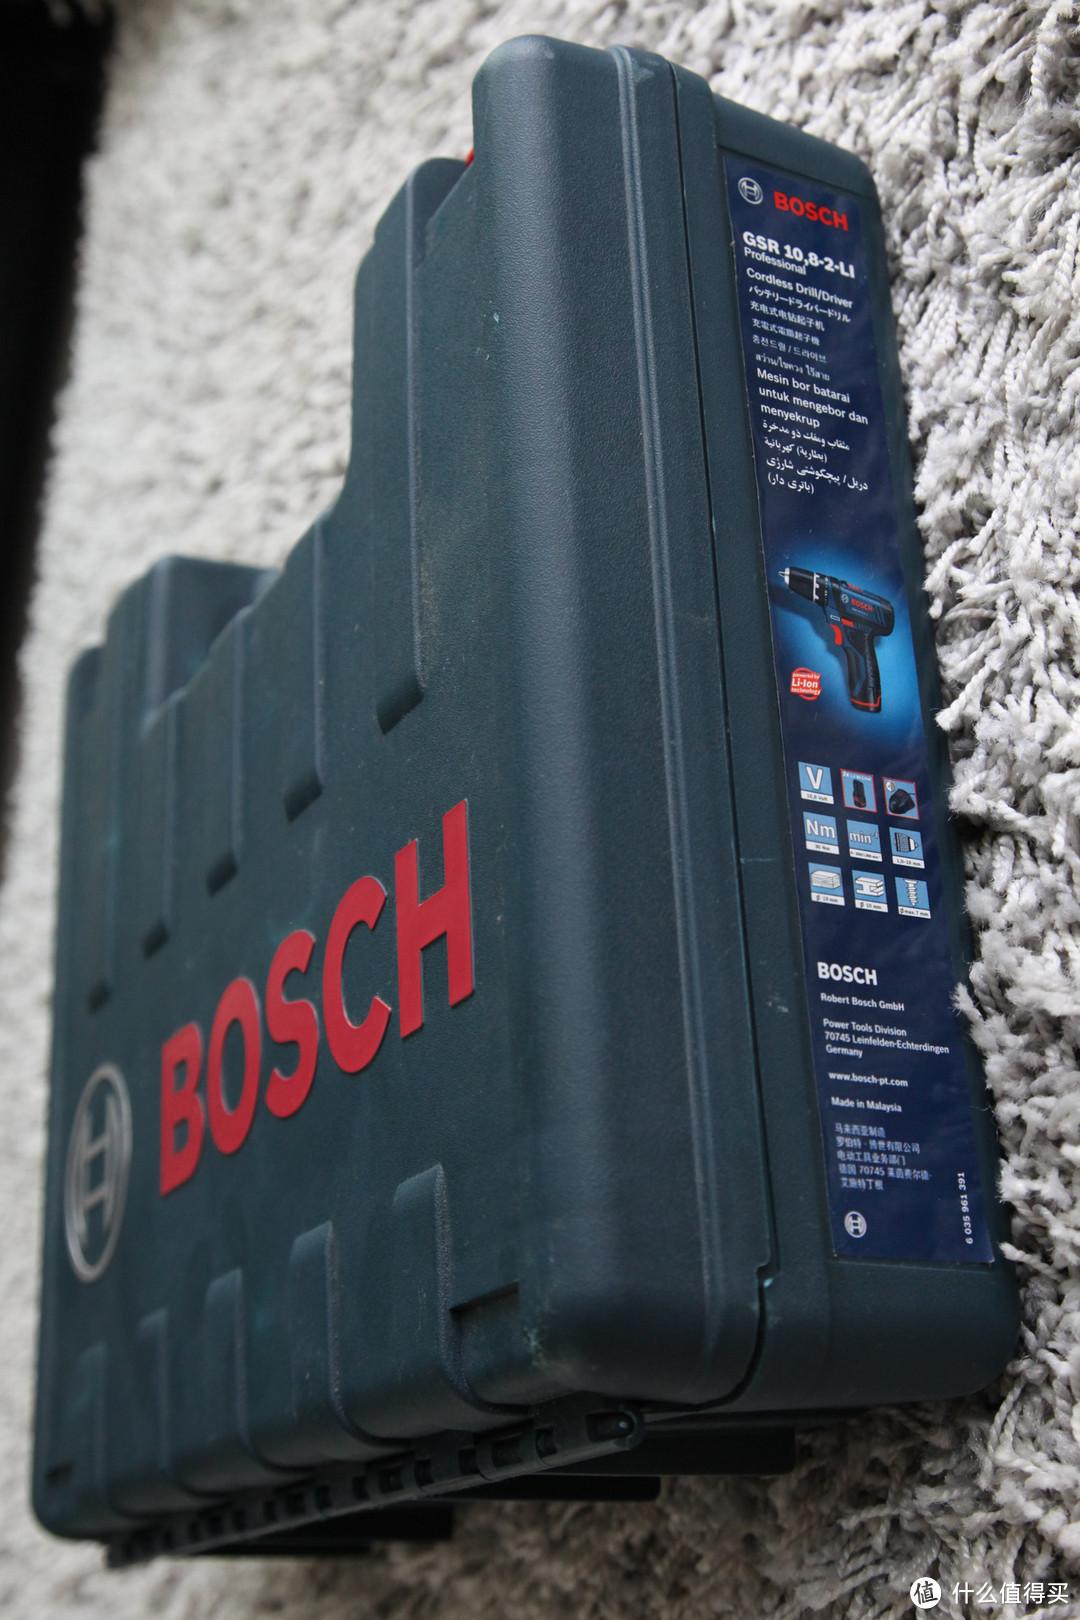 BOSCH 博世 GSR 10.8-2-LI Professional 充电式电钻起子机 & 小旋风批头套装